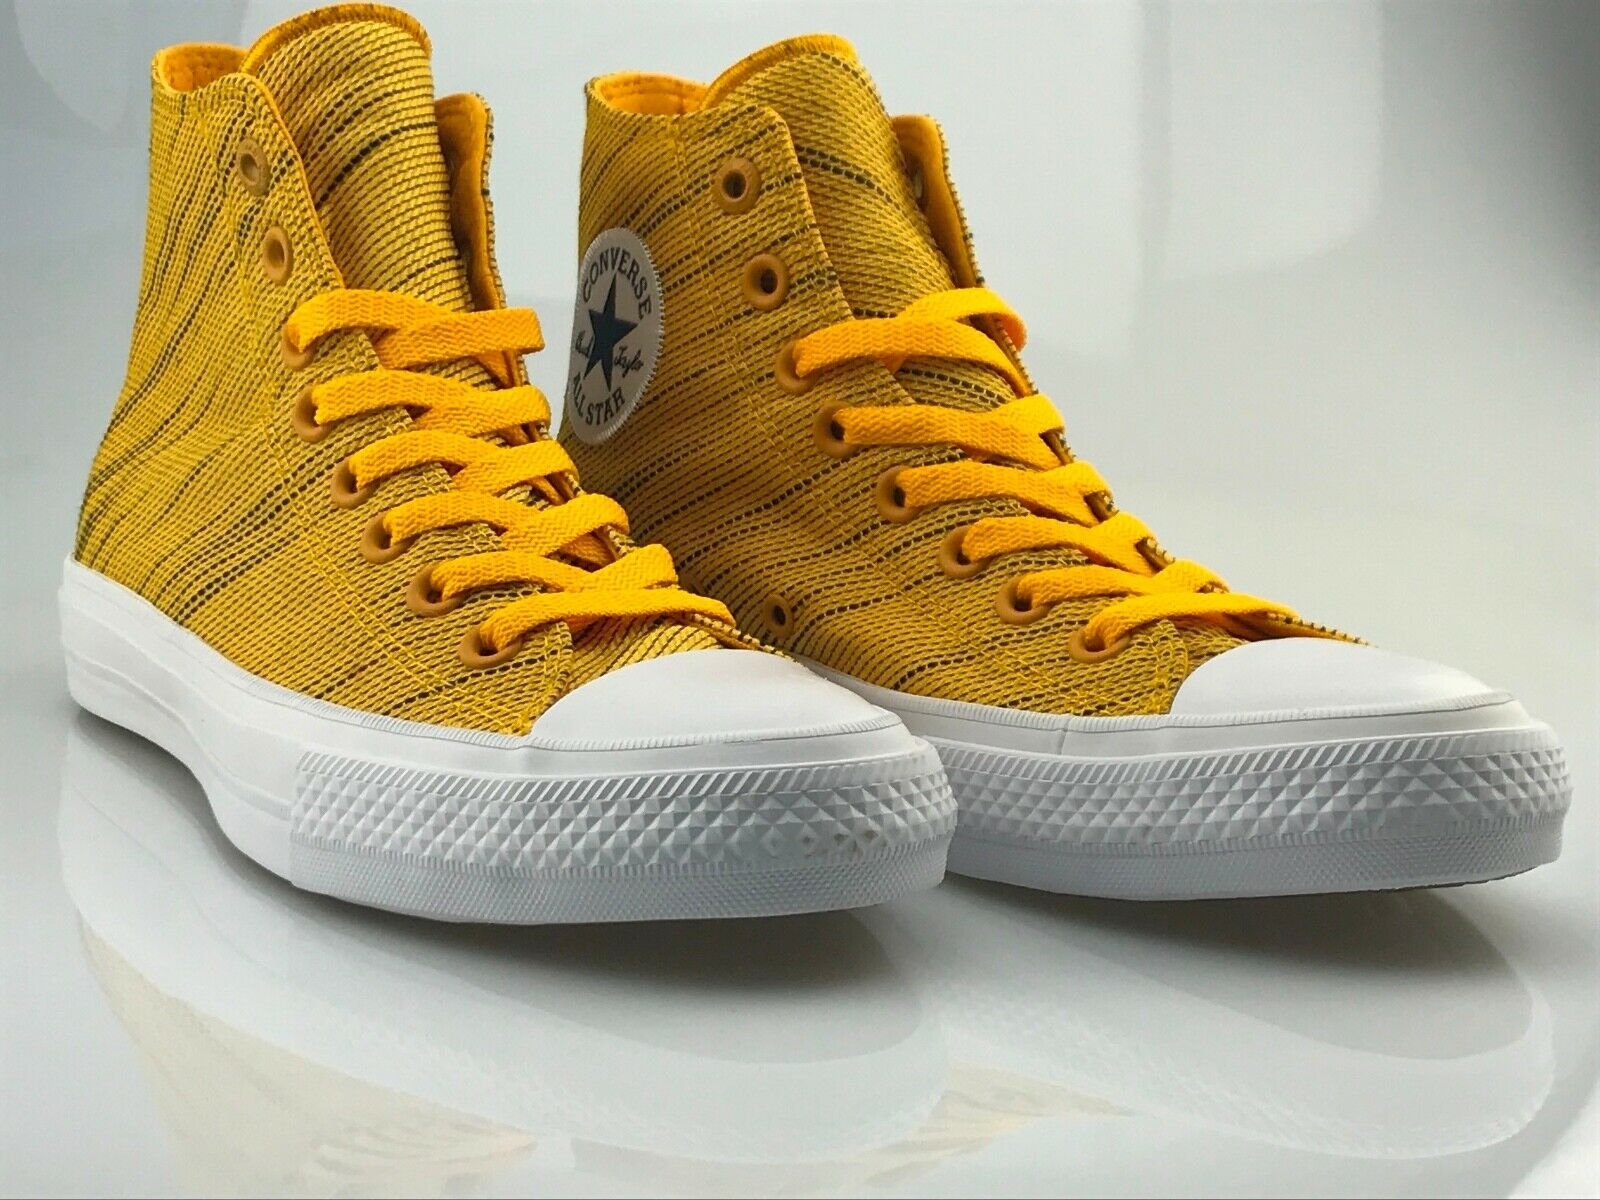 Converse Chuck Taylor All Star II knit high jaune 151088 C paniers Unisexe